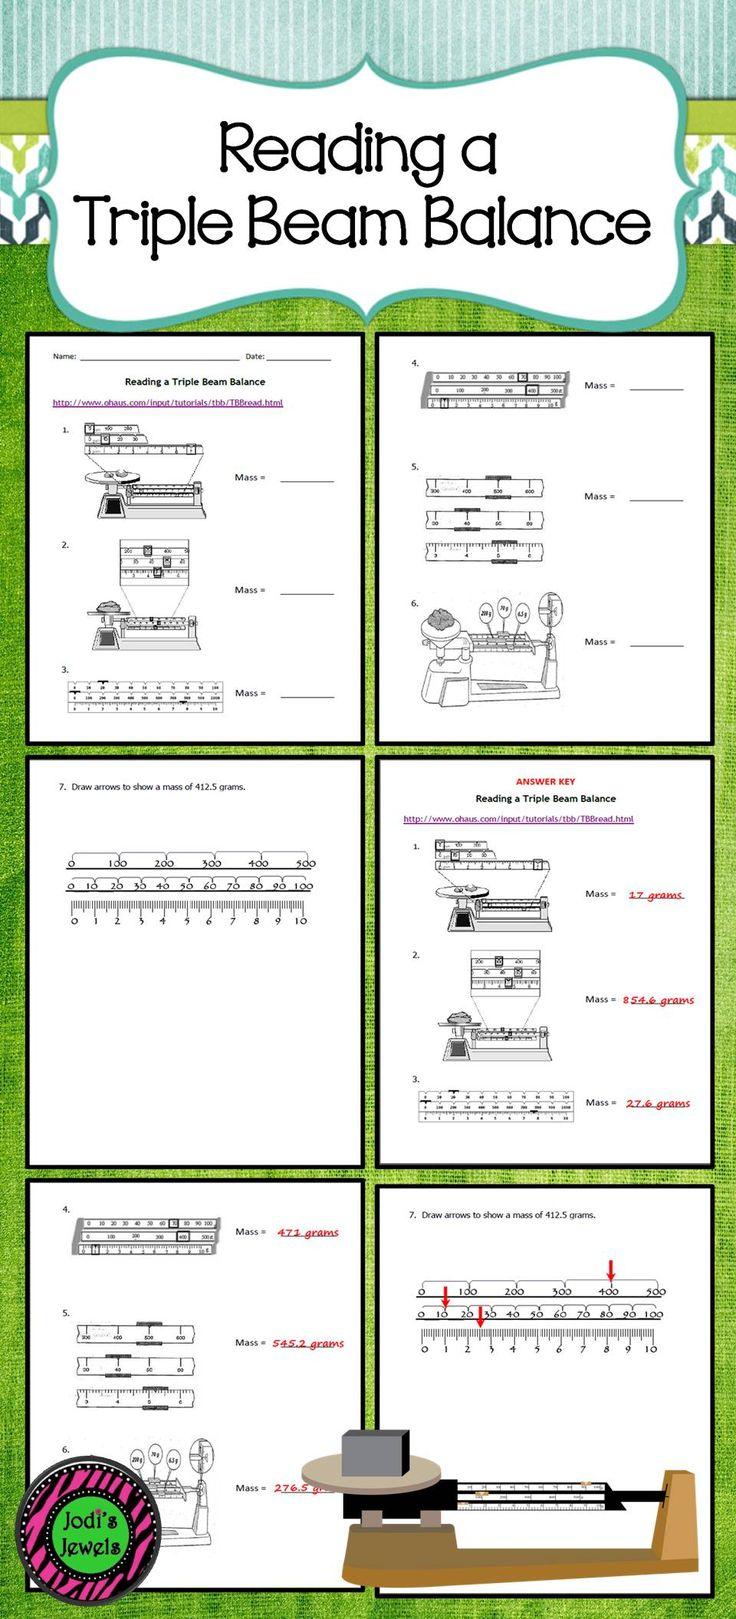 reading a triple beam balance diagram 34663 vizualize. Black Bedroom Furniture Sets. Home Design Ideas